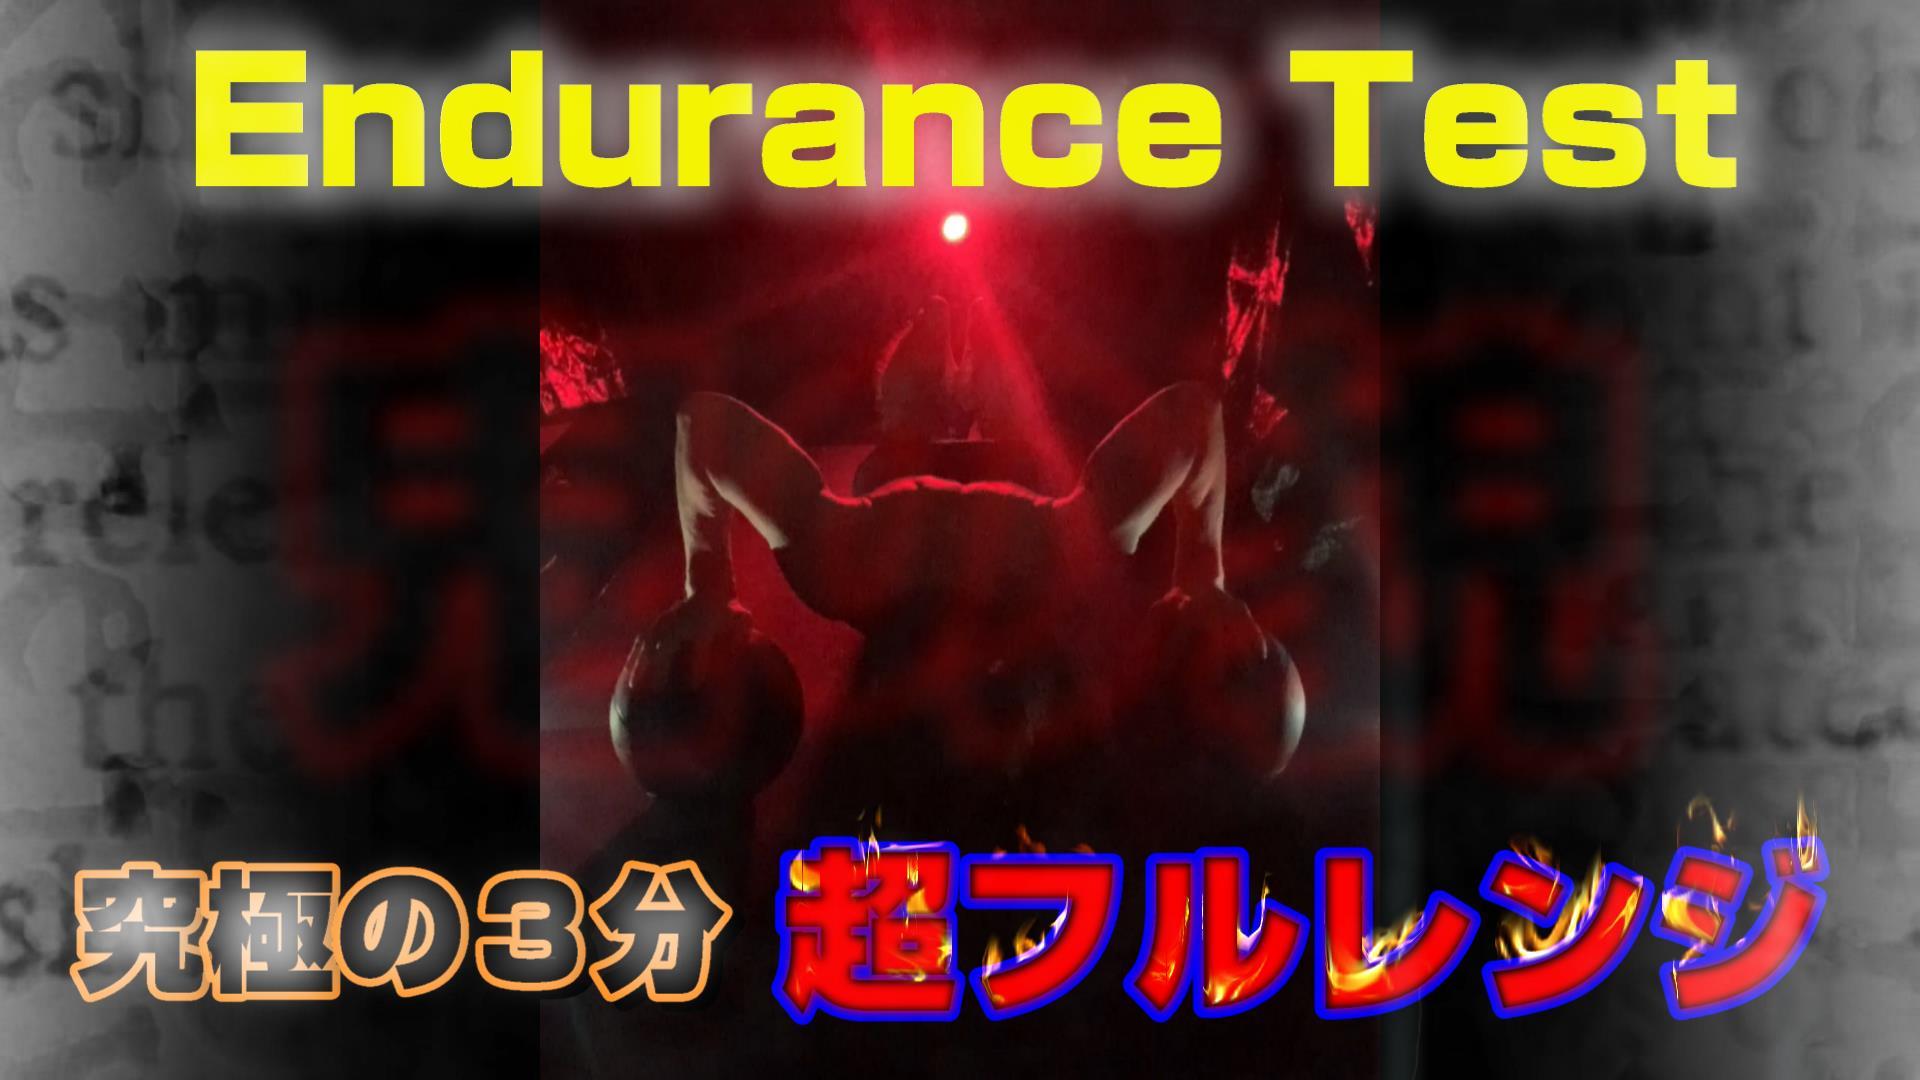 Ultimate 3 minutes【Super Full range Push ups】Endurance Test